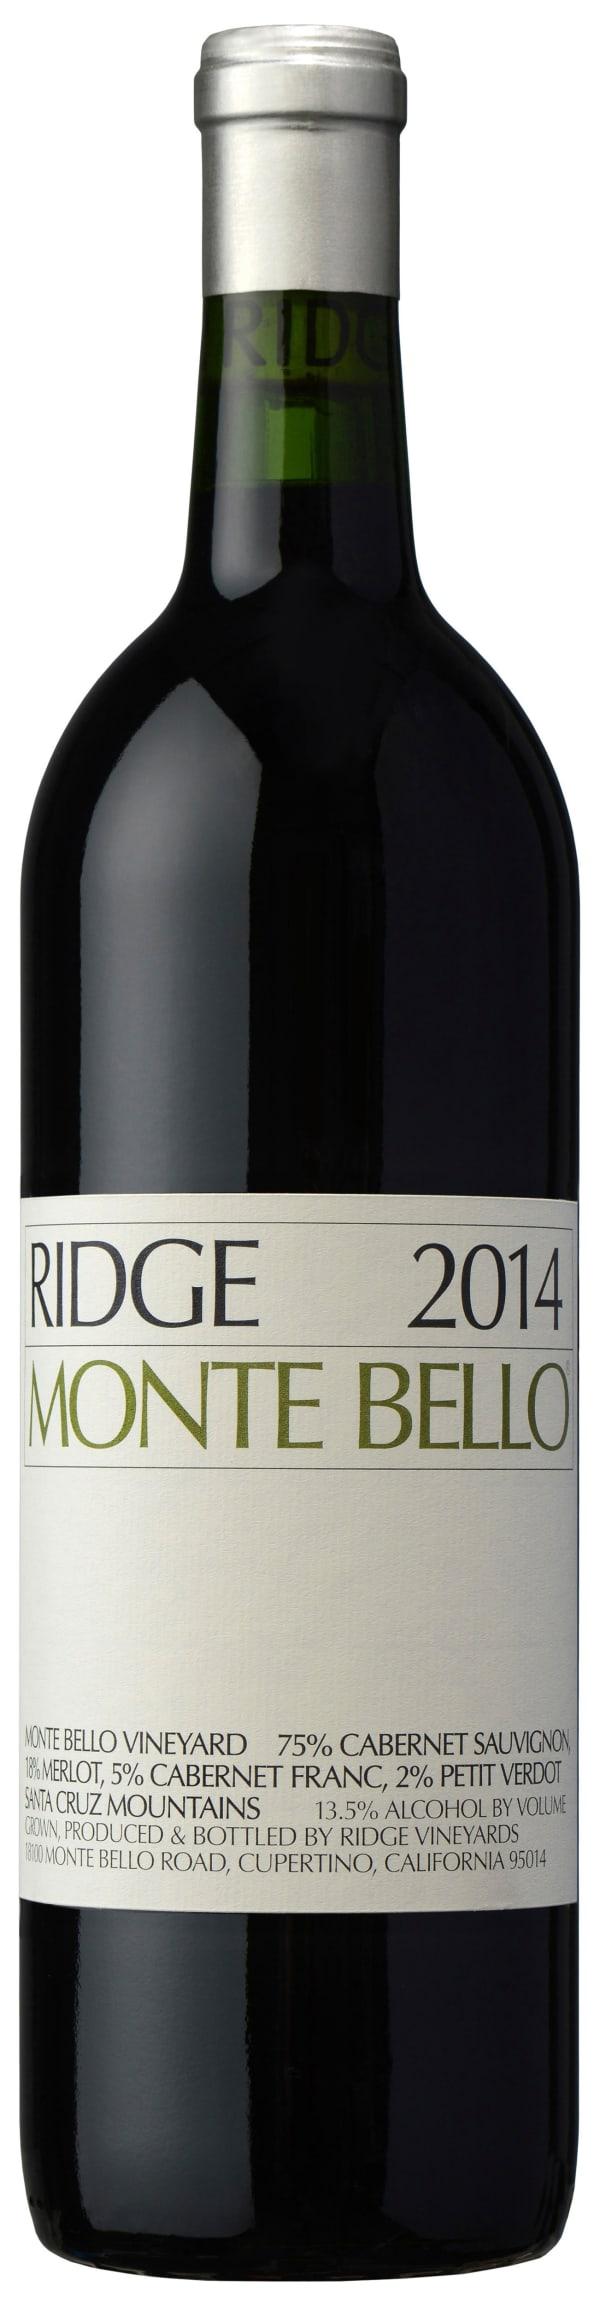 Ridge Monte Bello 2014